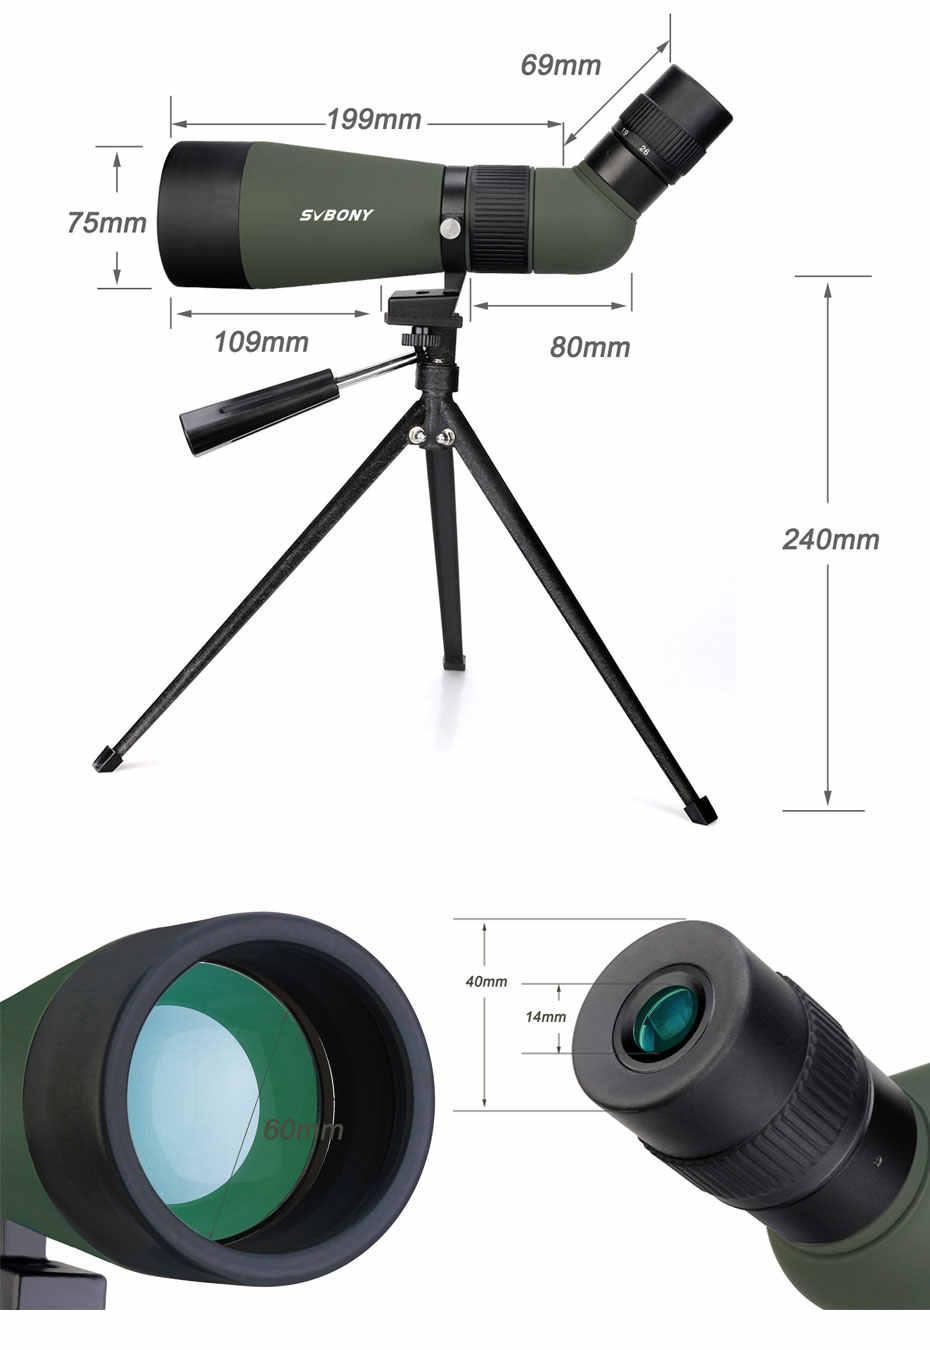 SVBONY SV404 12-26x60 Zoom Spotting Scope BK7 Multicoated Optics Lens Telescope Hunting Shooting Monocular w/Desktop Tripod